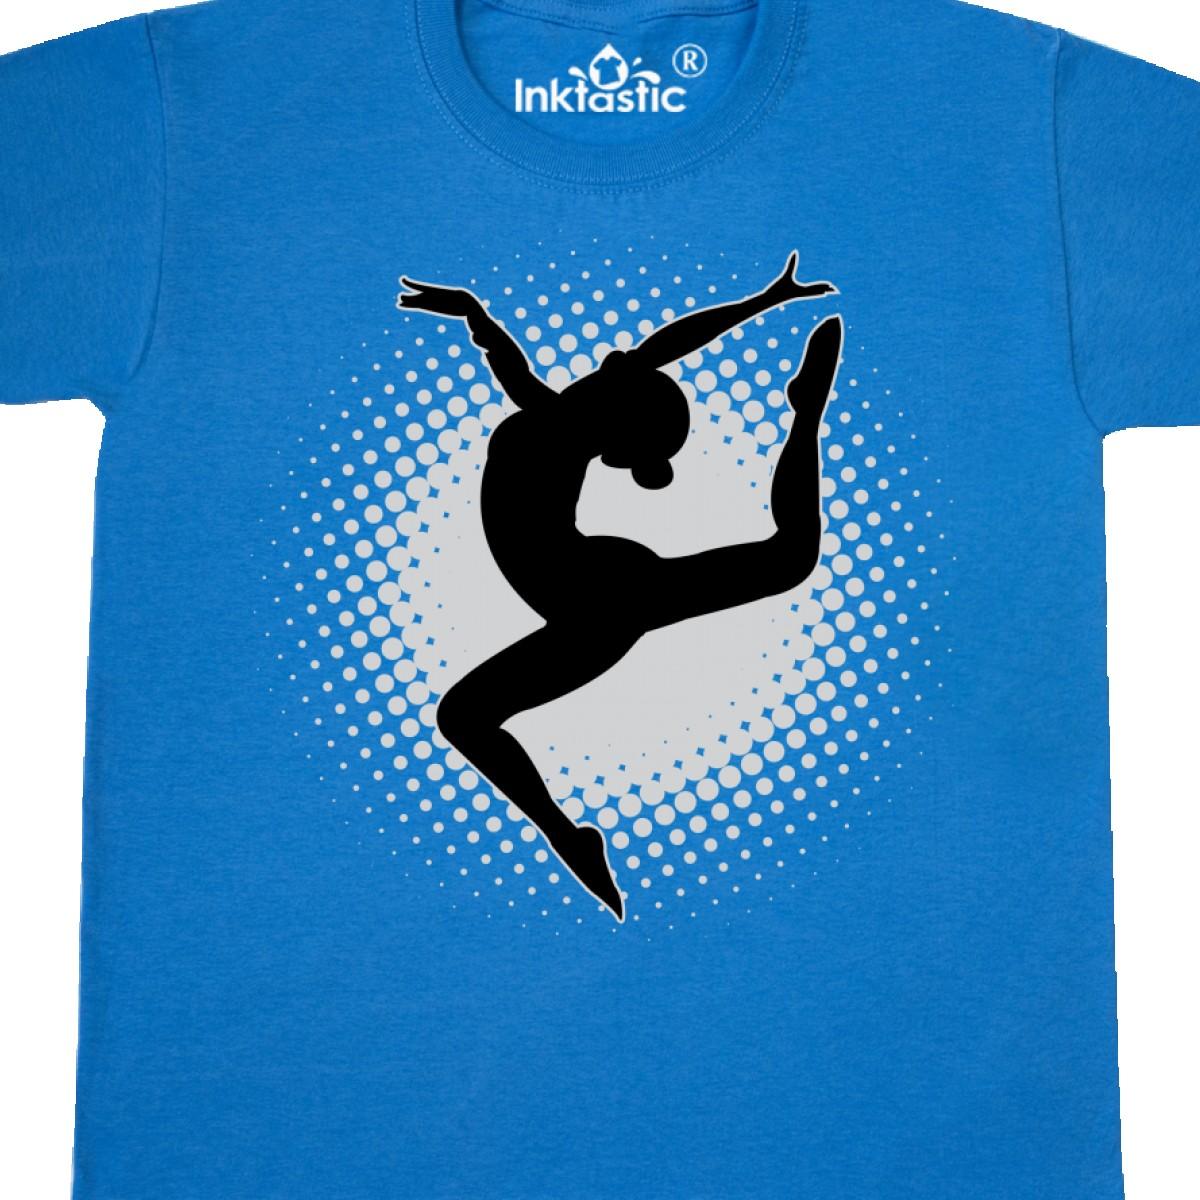 c0cd0edfc Inktastic Ballet Dancer Silhouette Ballerina Youth T-Shirt Dancing ...